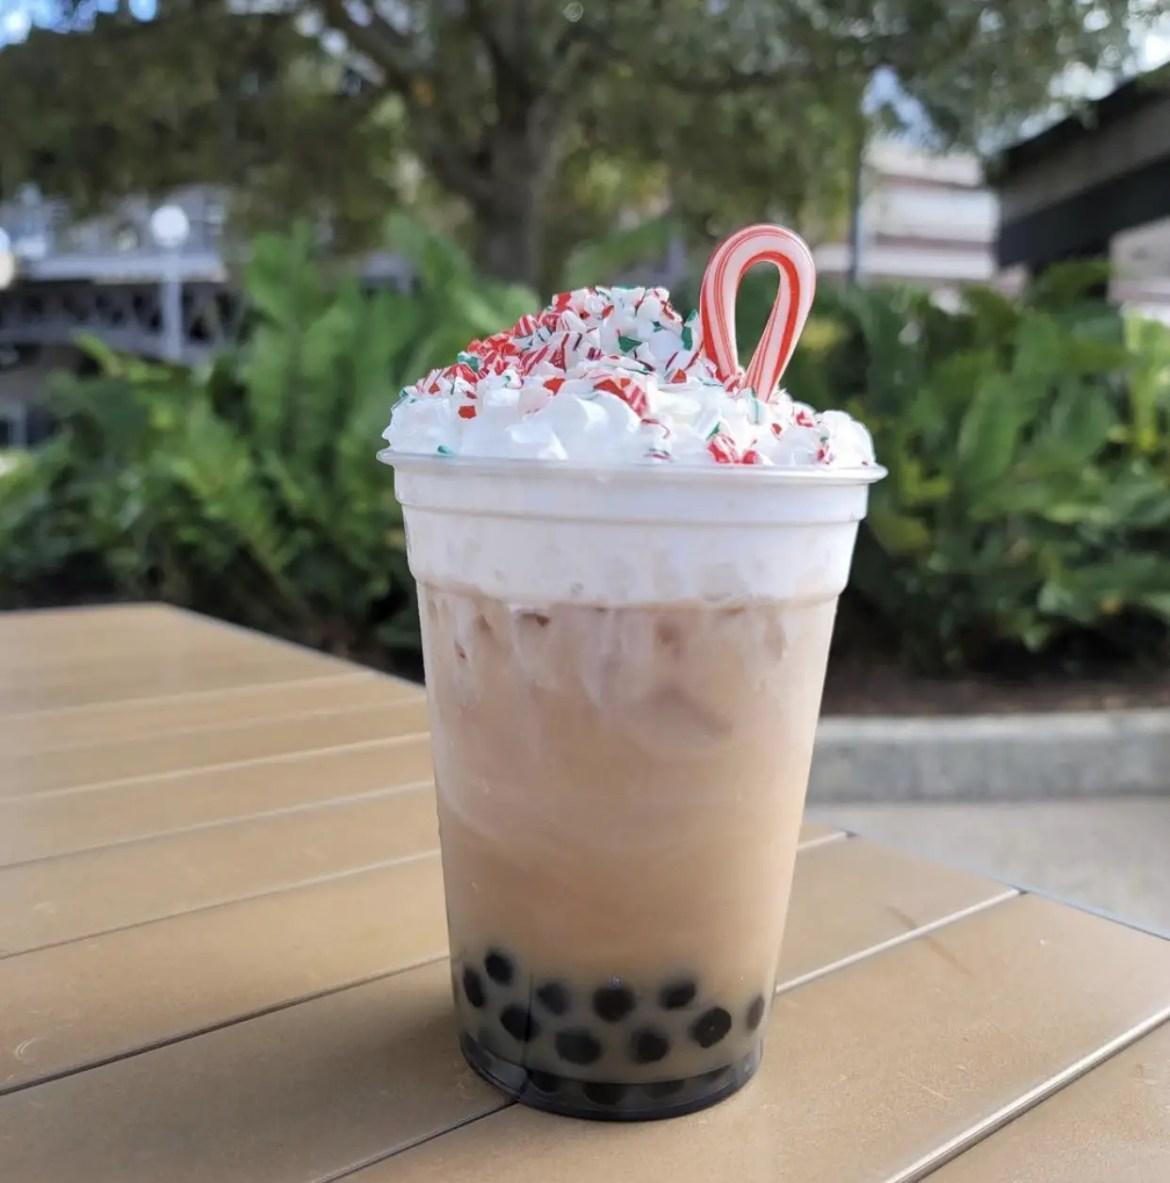 Holiday Peppermint Boba Tea at YeSake in Disney Springs!